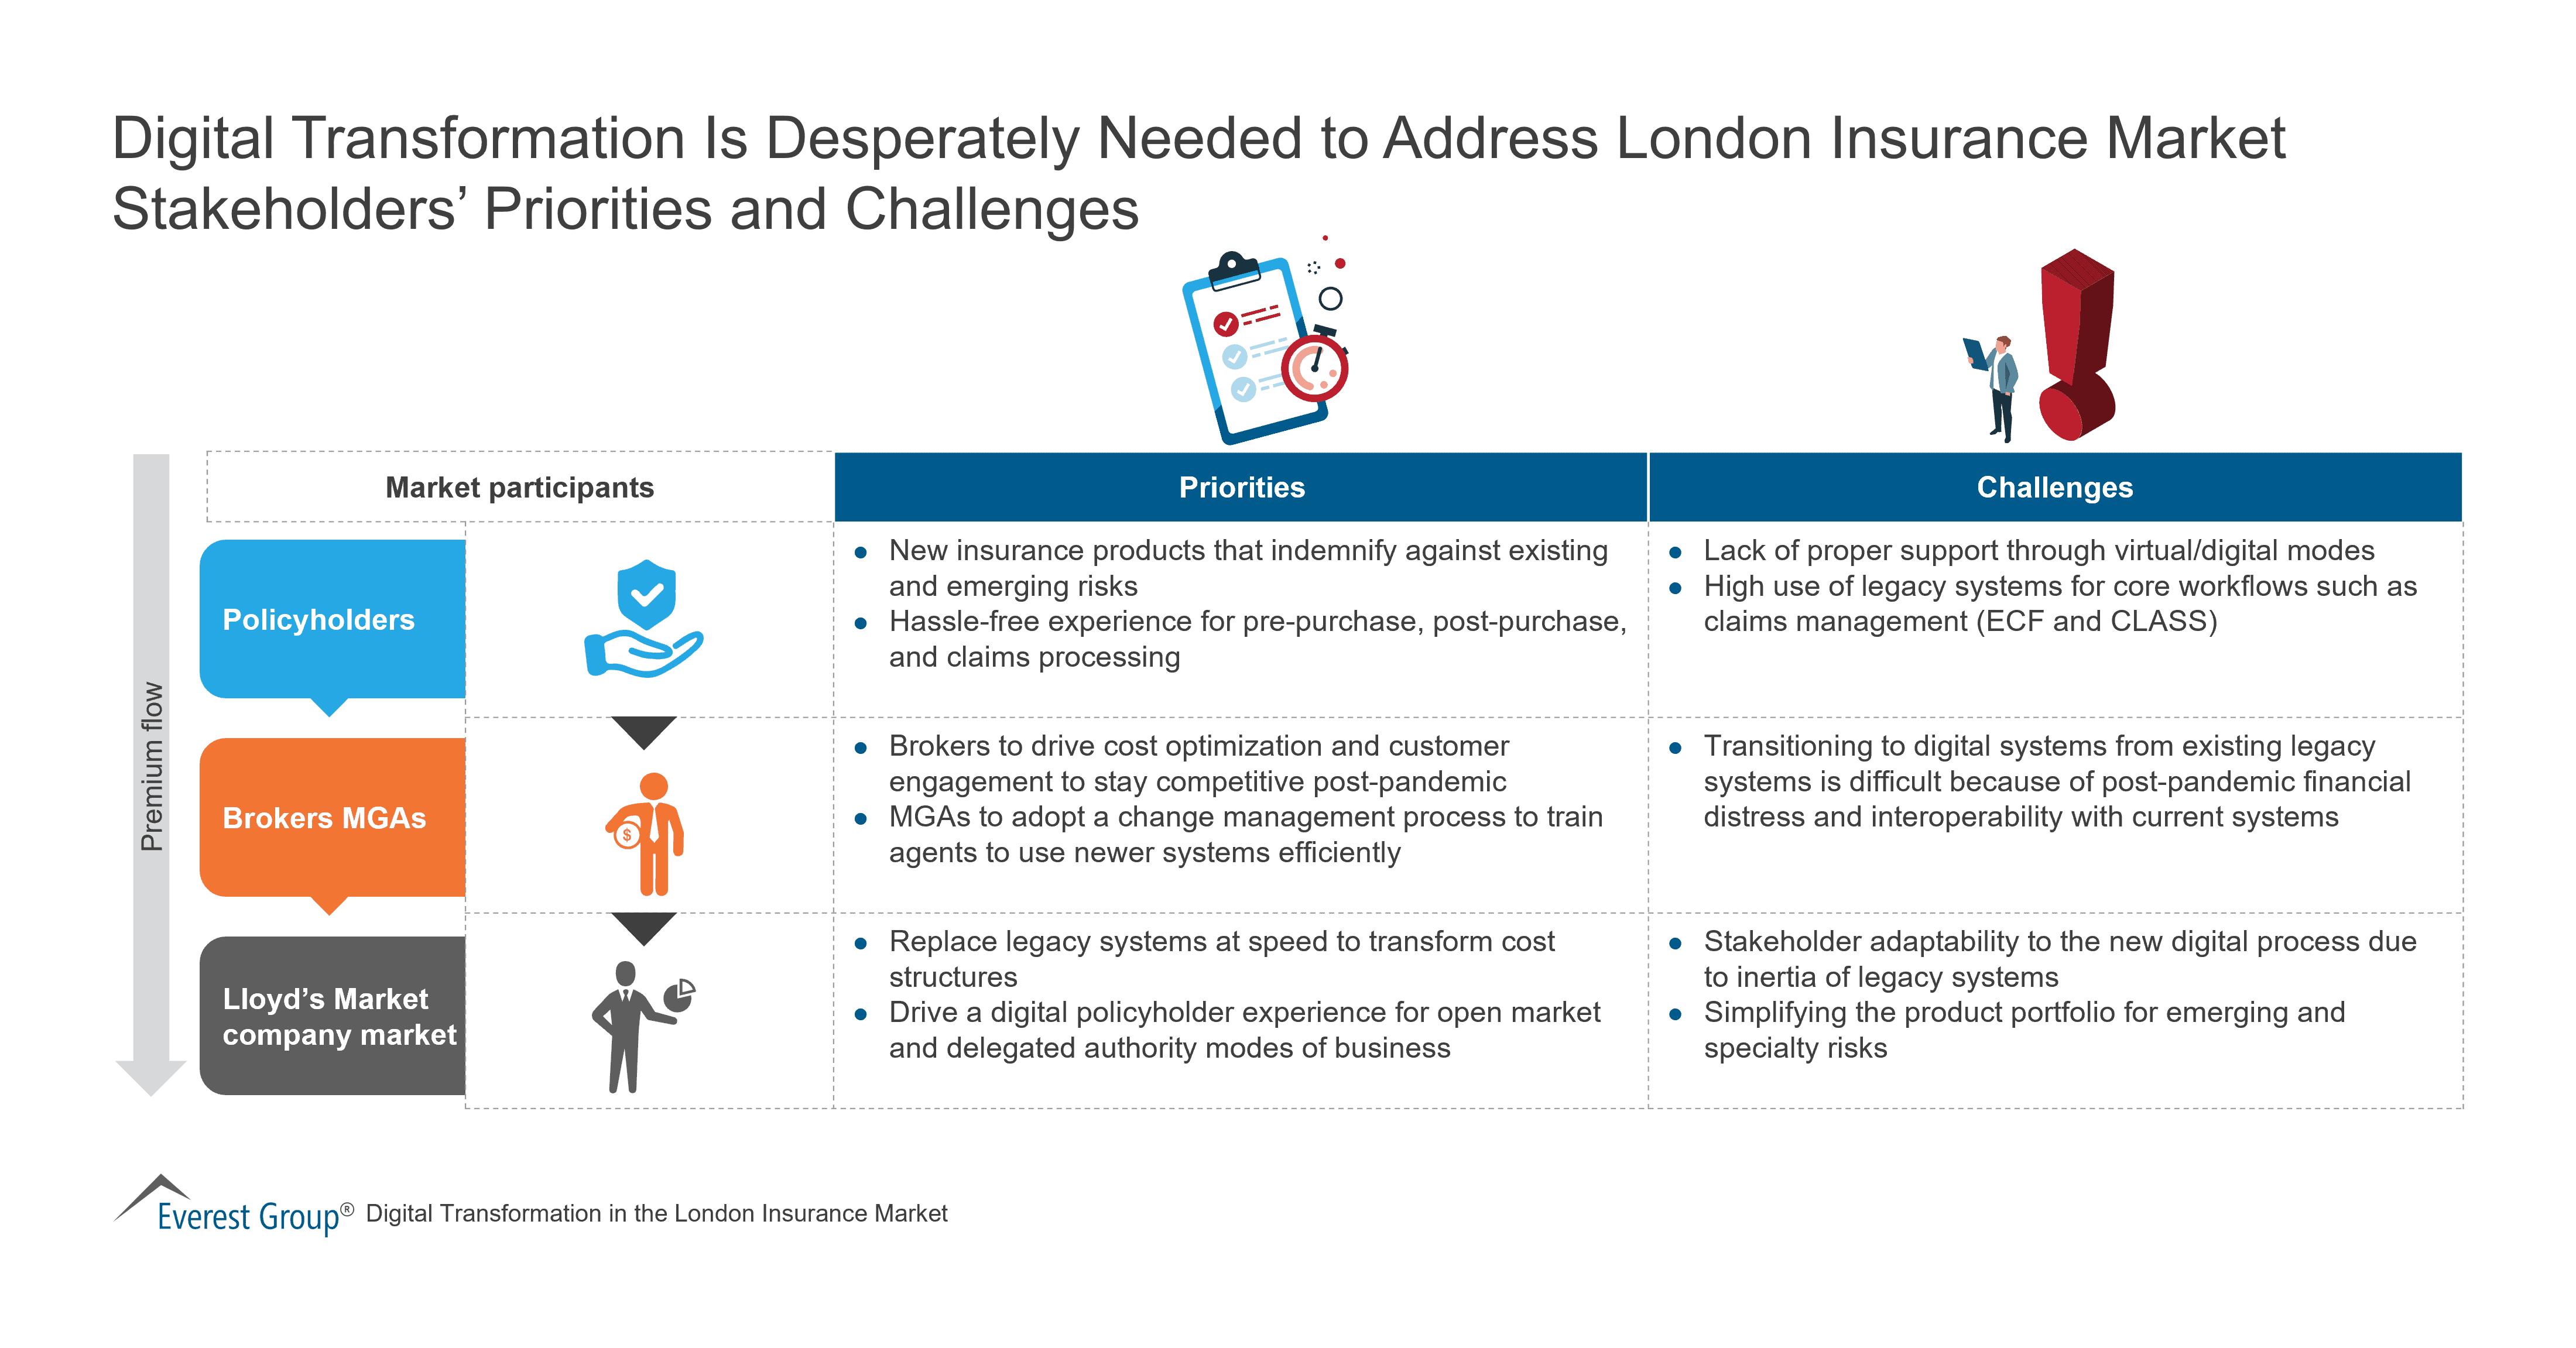 Digital Transformation in the London Insurance Market for PR